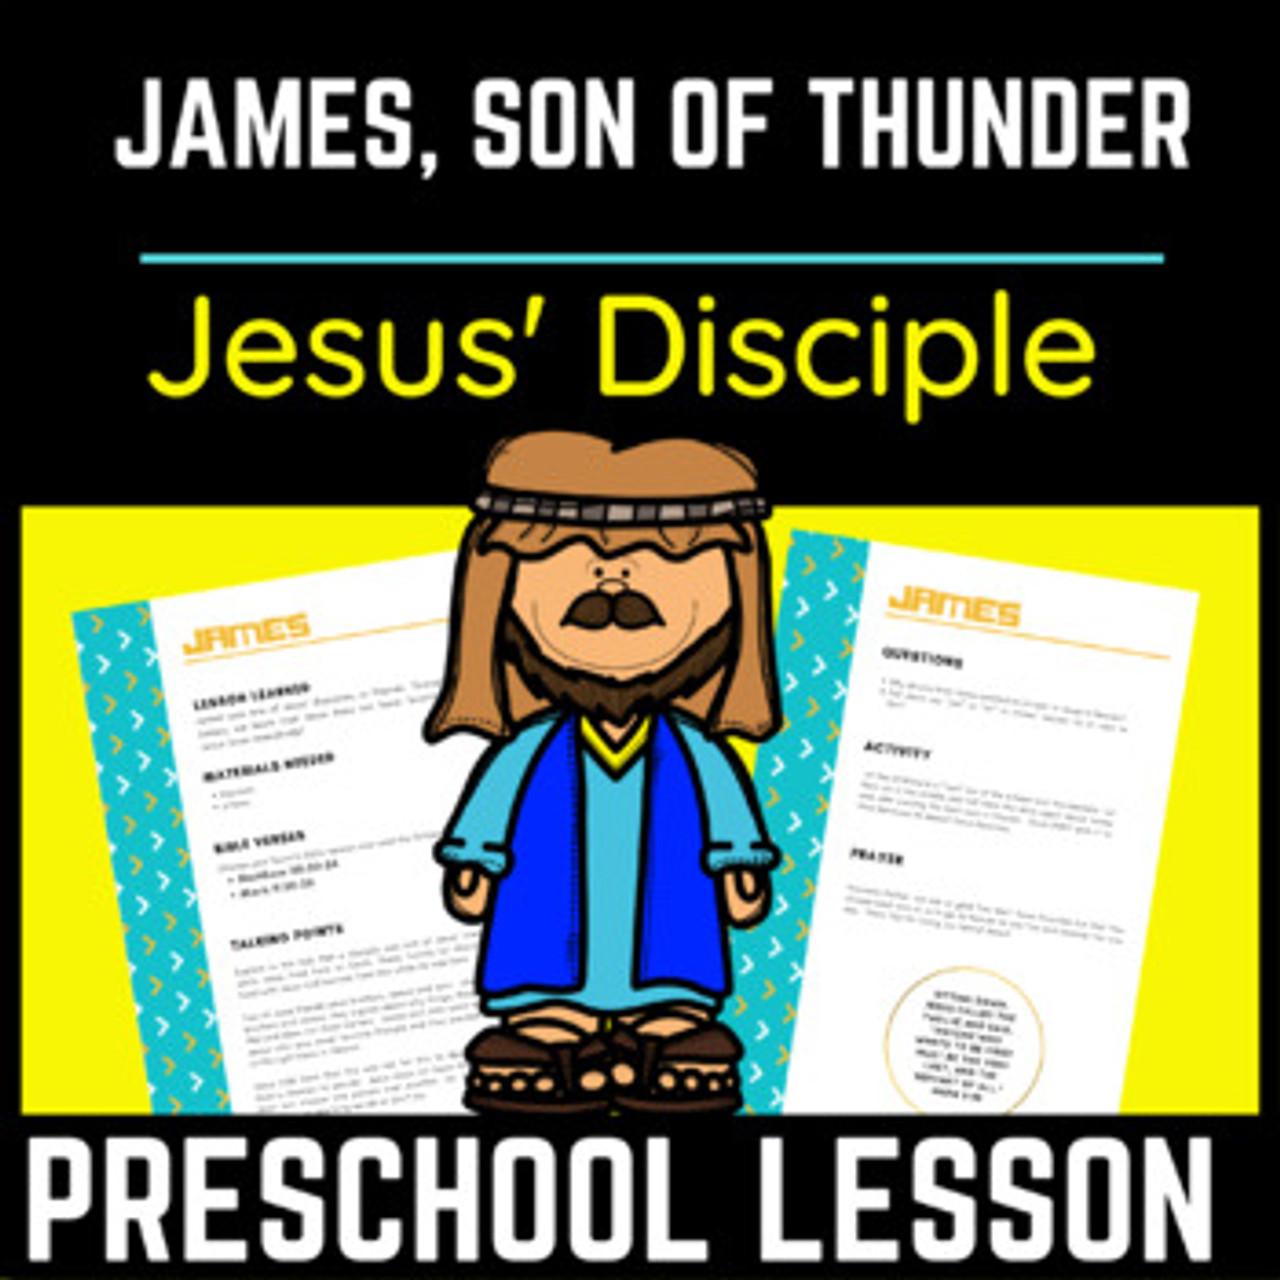 James, Son of Thunder   Christian Preschool Devotion about Jesus' Disciple